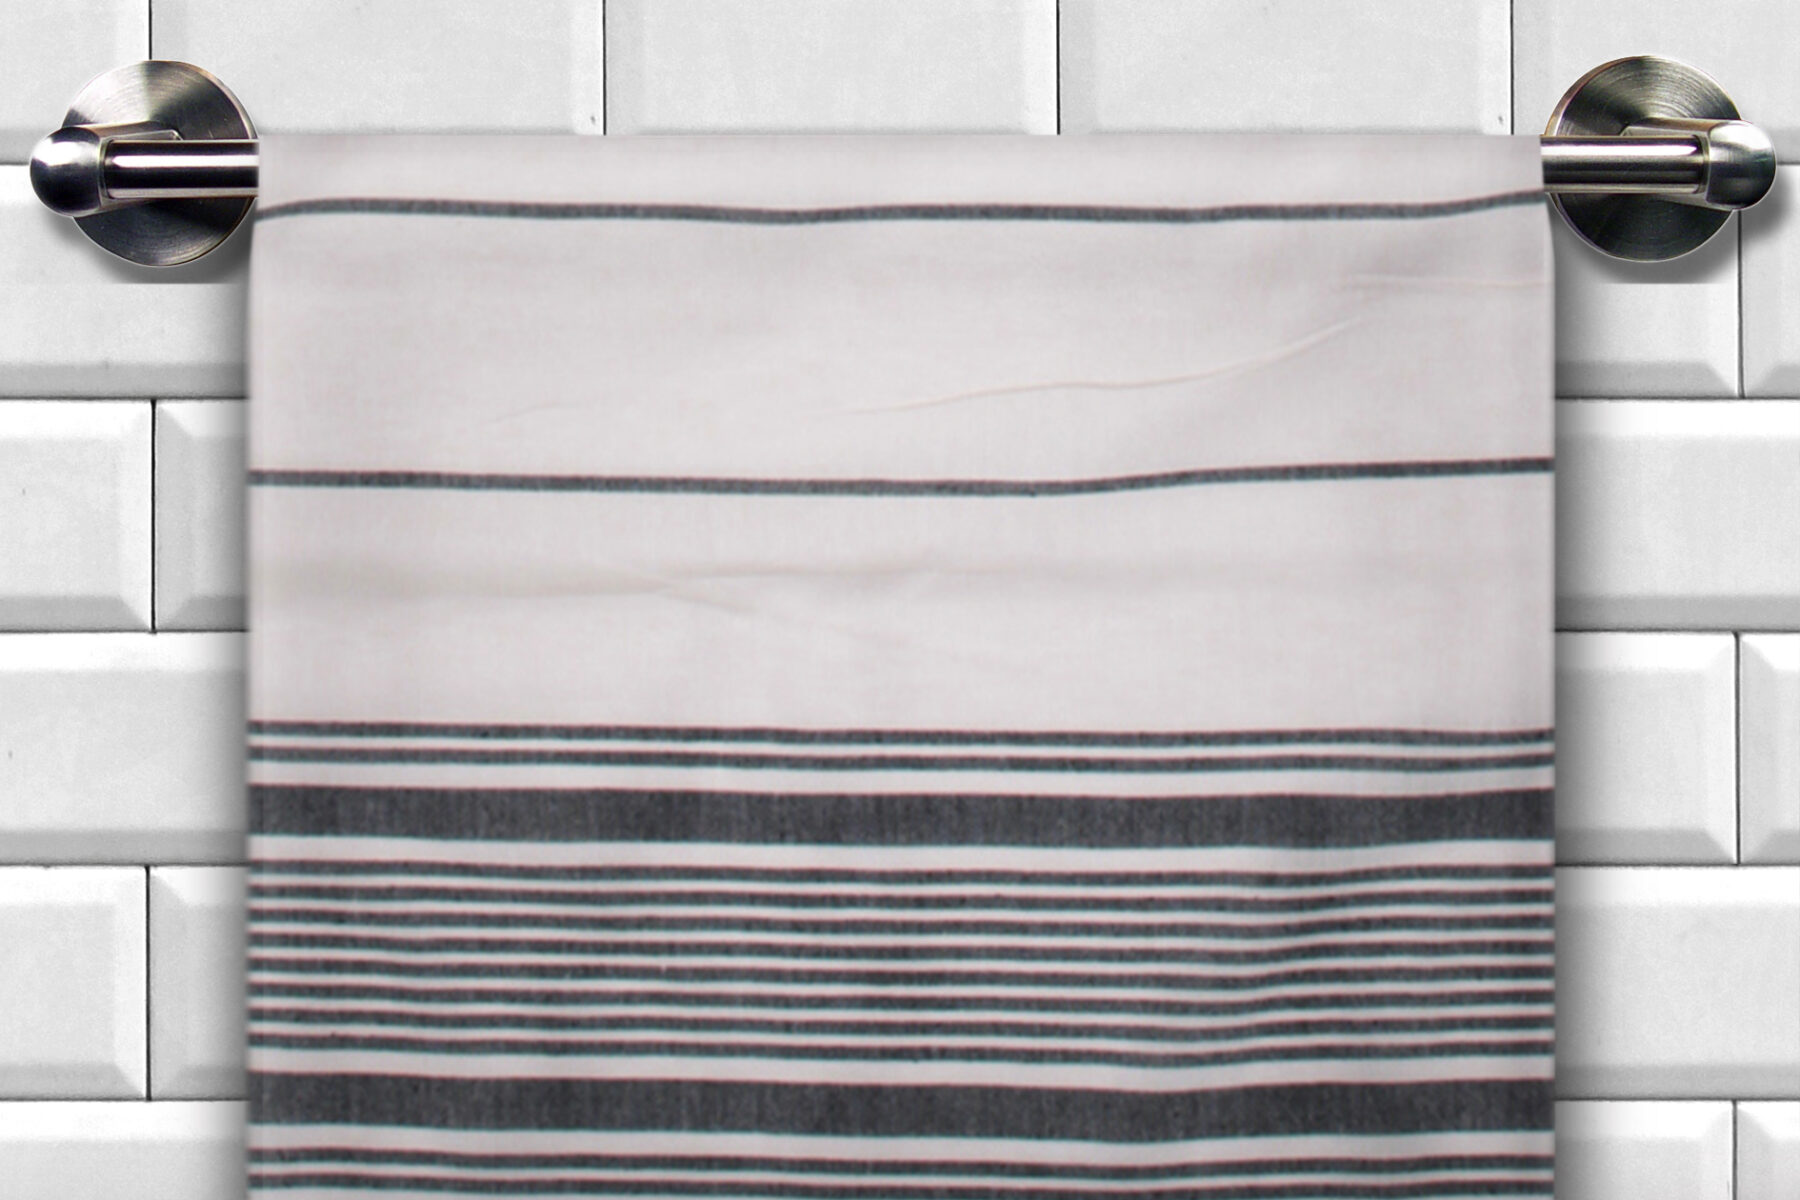 227465151-fine-cotton-pestemal-hanging